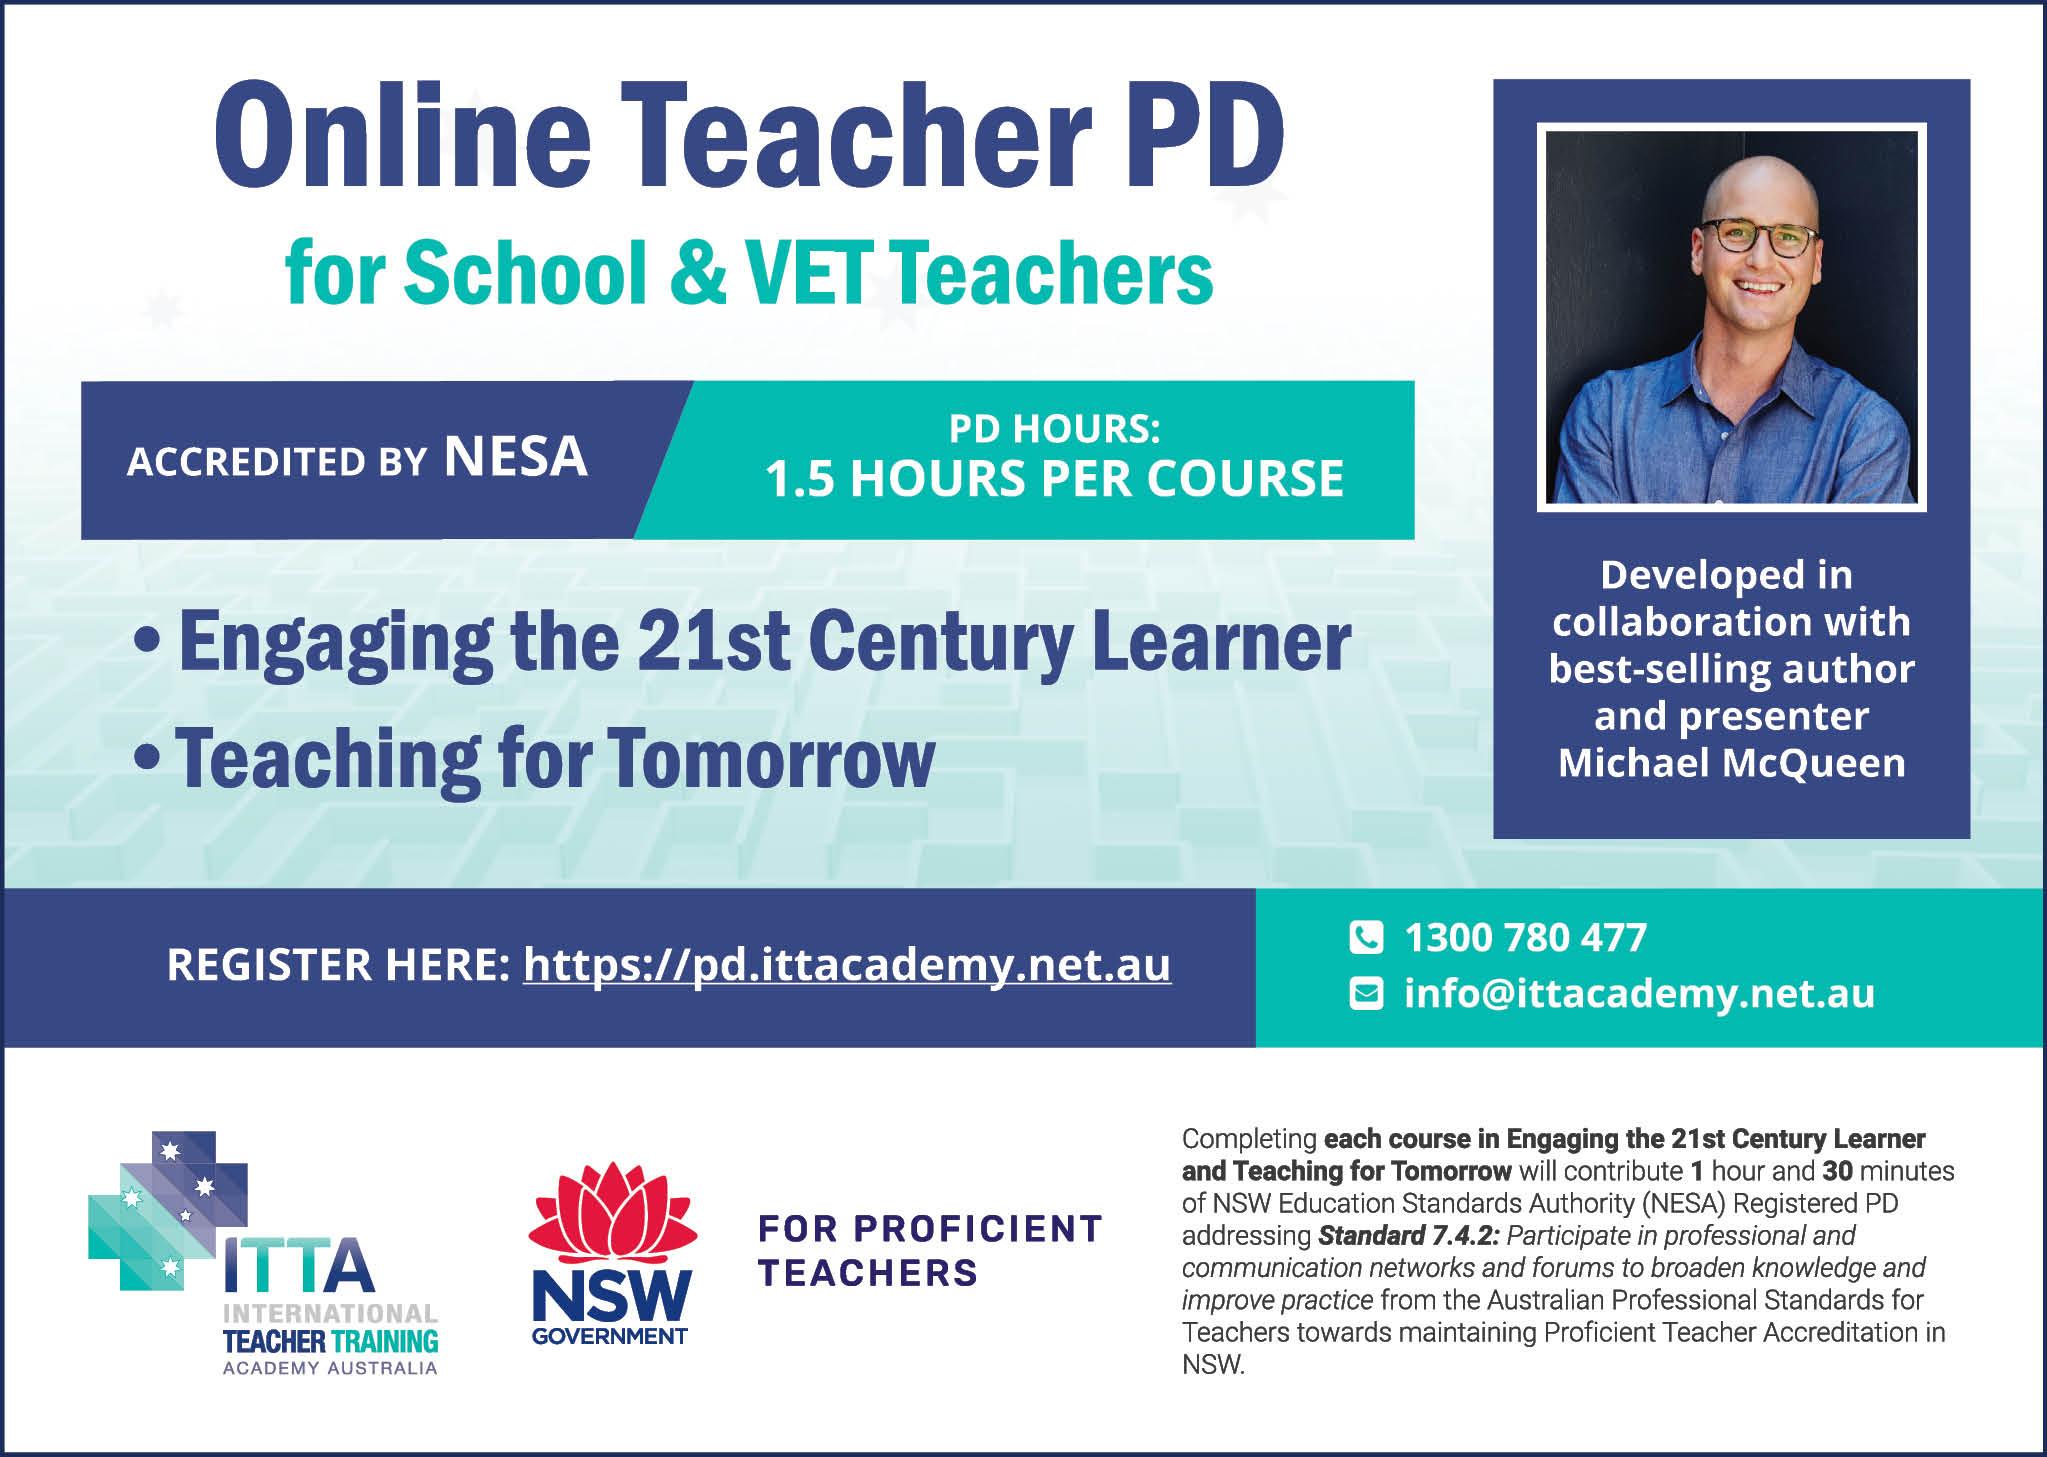 International Teacher Training Academy Australia